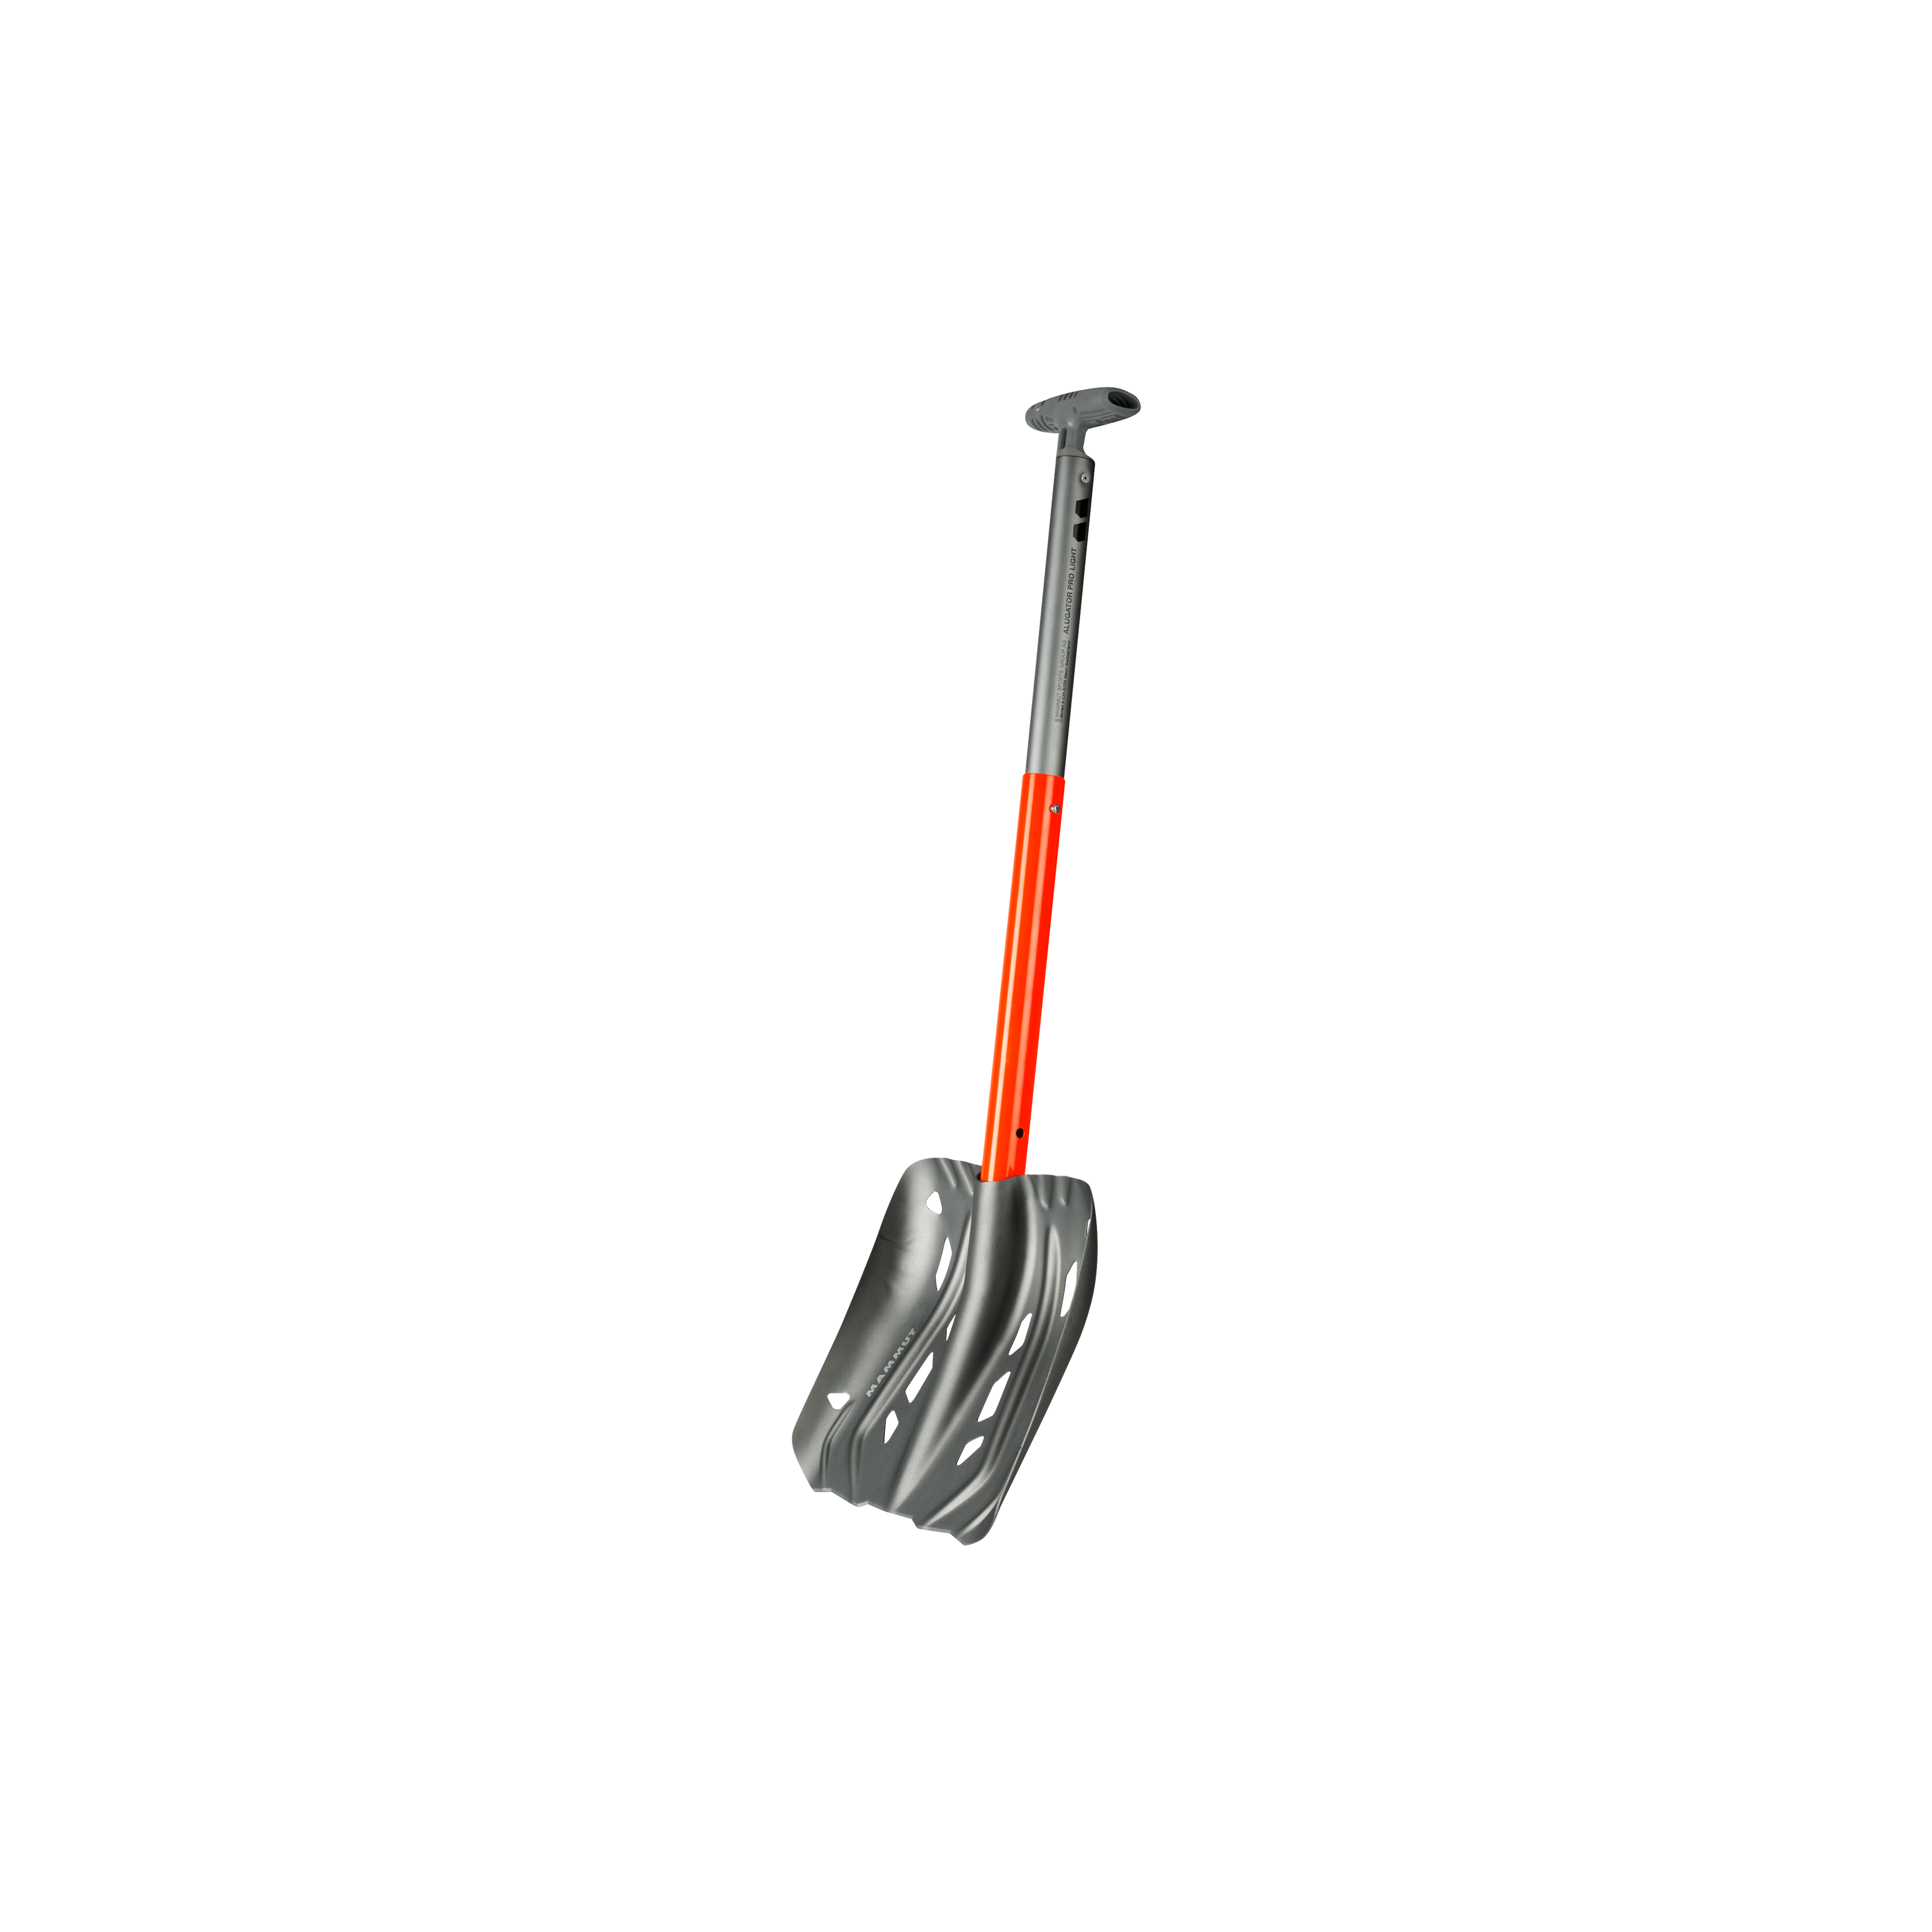 Alugator Pro Light - neon orange, one size thumbnail